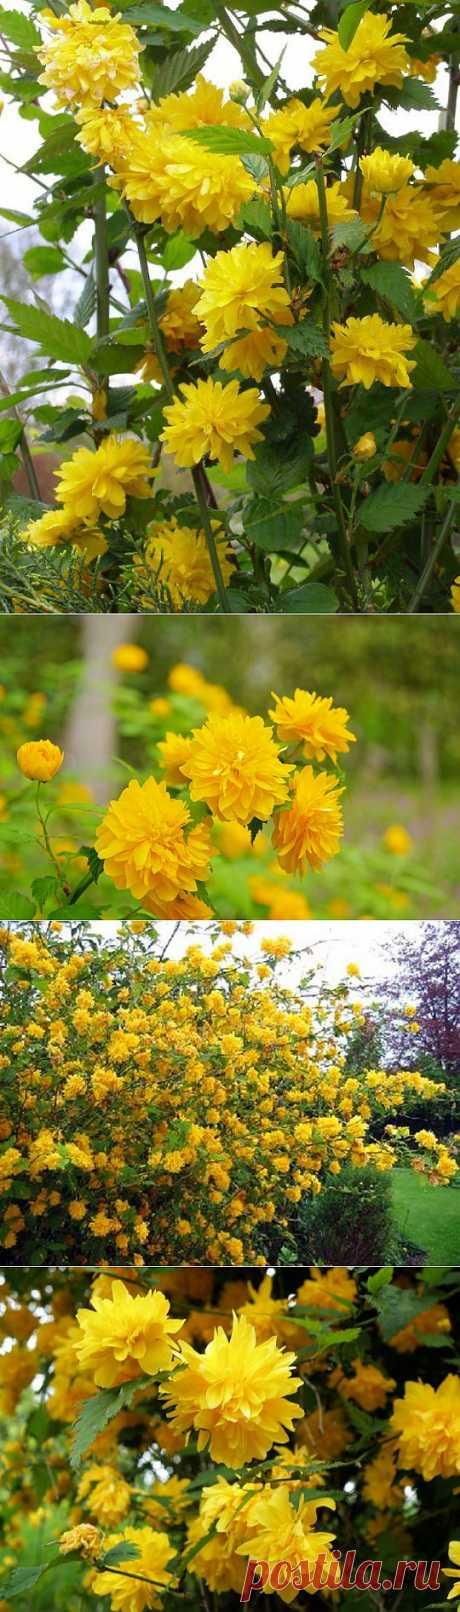 Керия - японская роза   6 соток